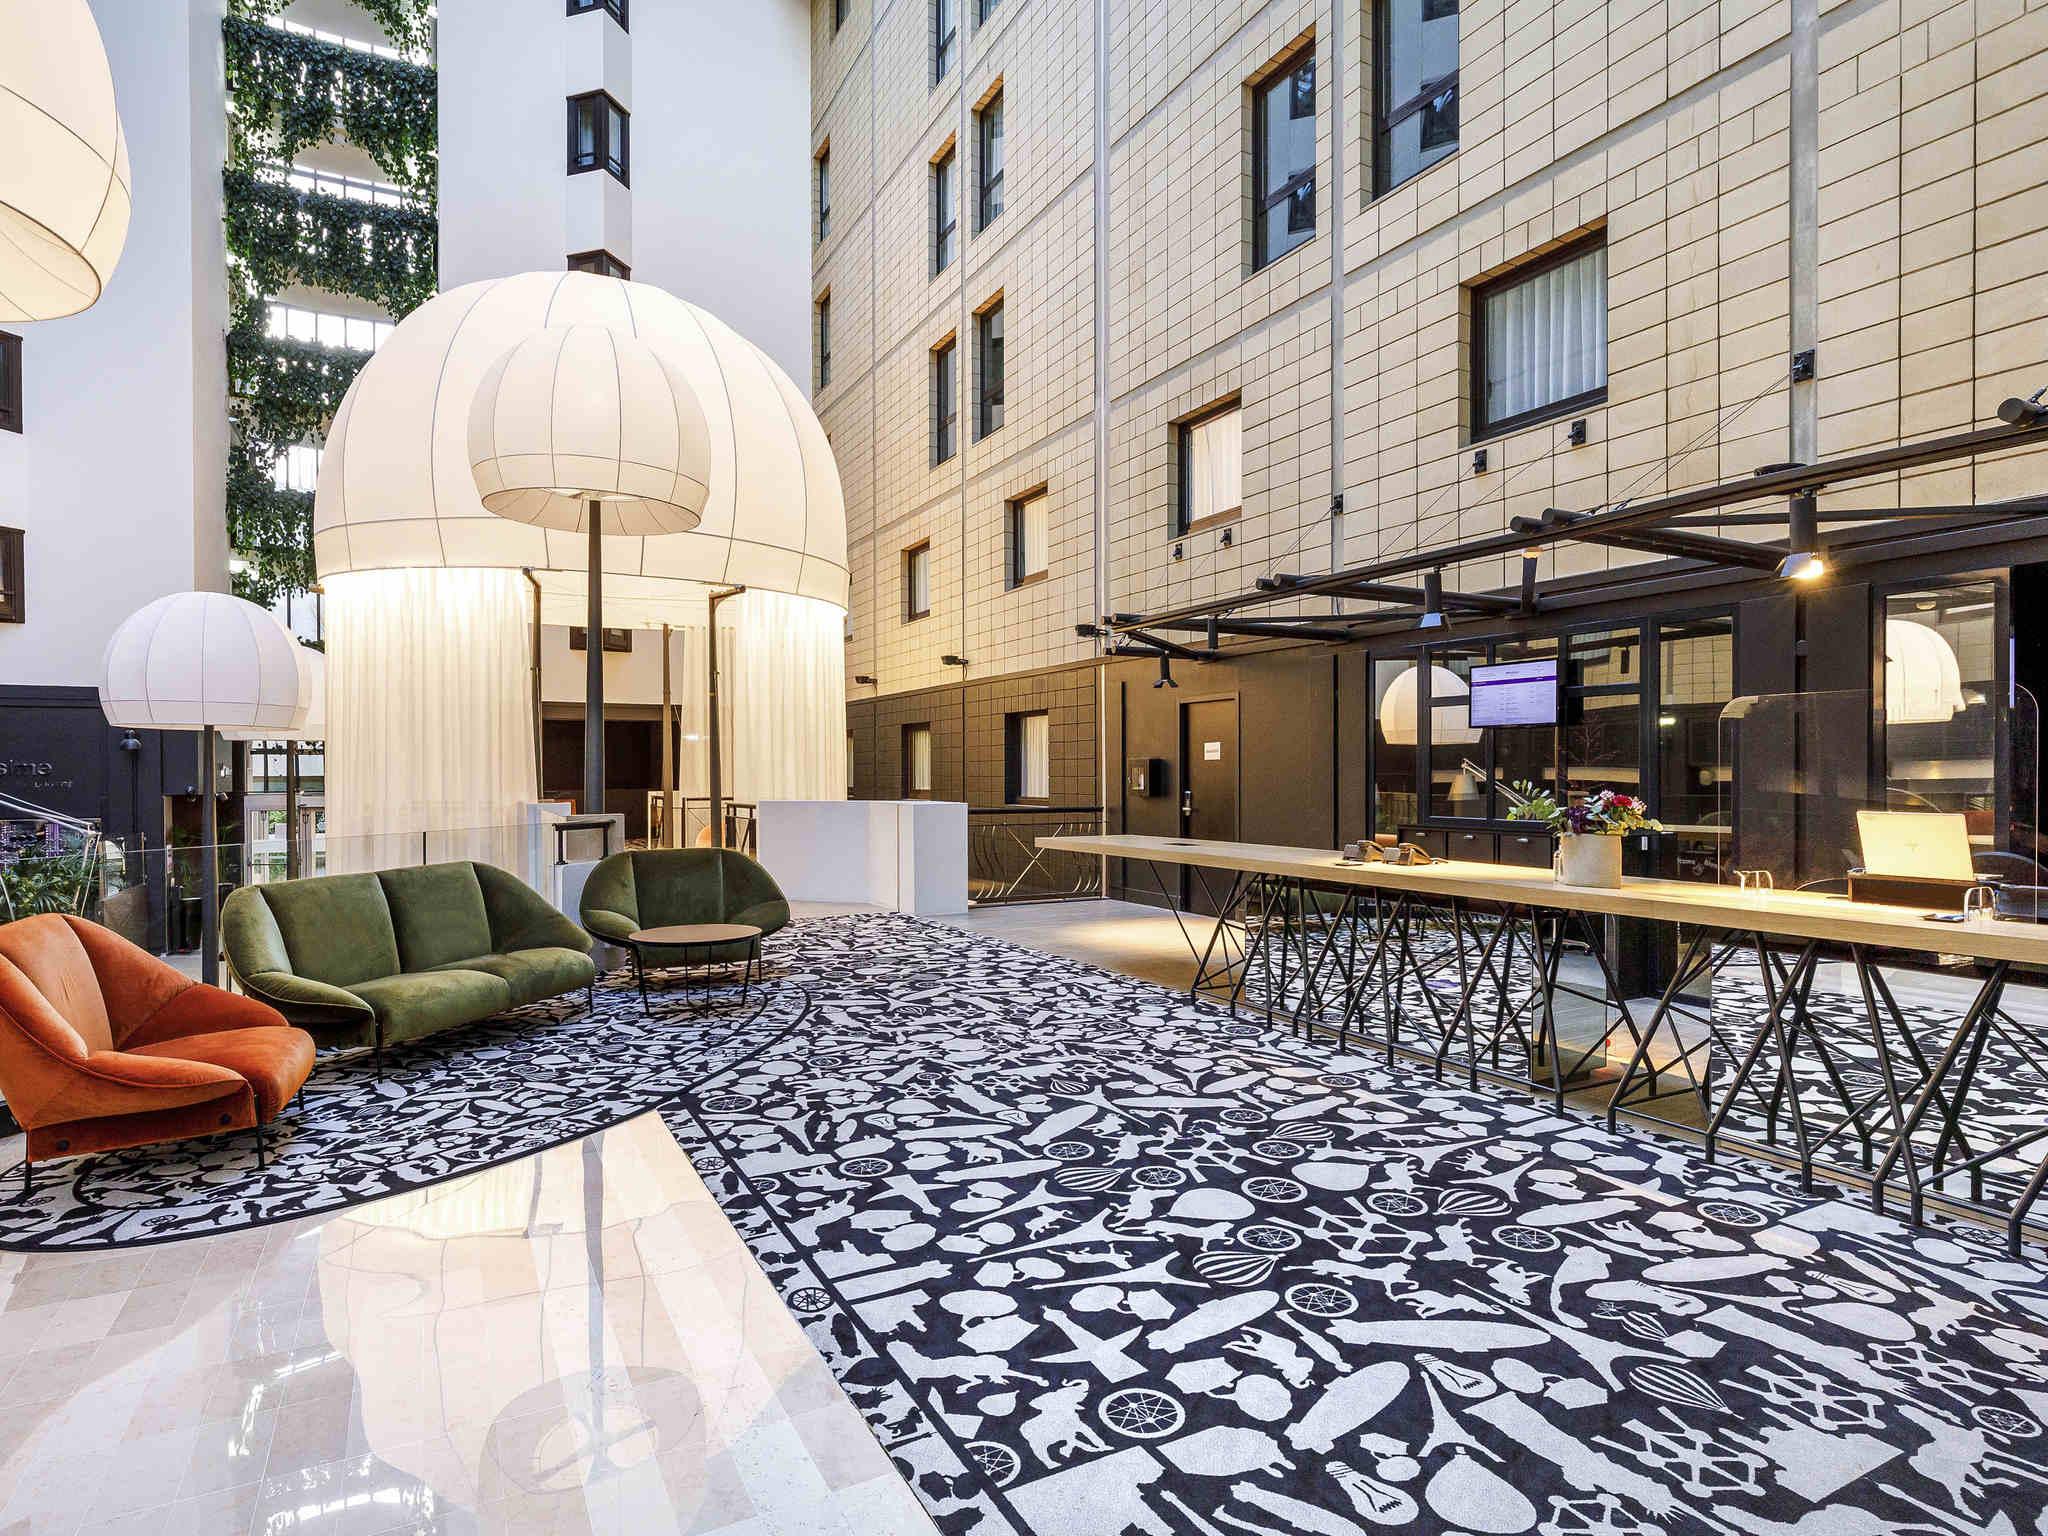 Hotel – Albergo Mercure Parigi Porte de Versailles Expo